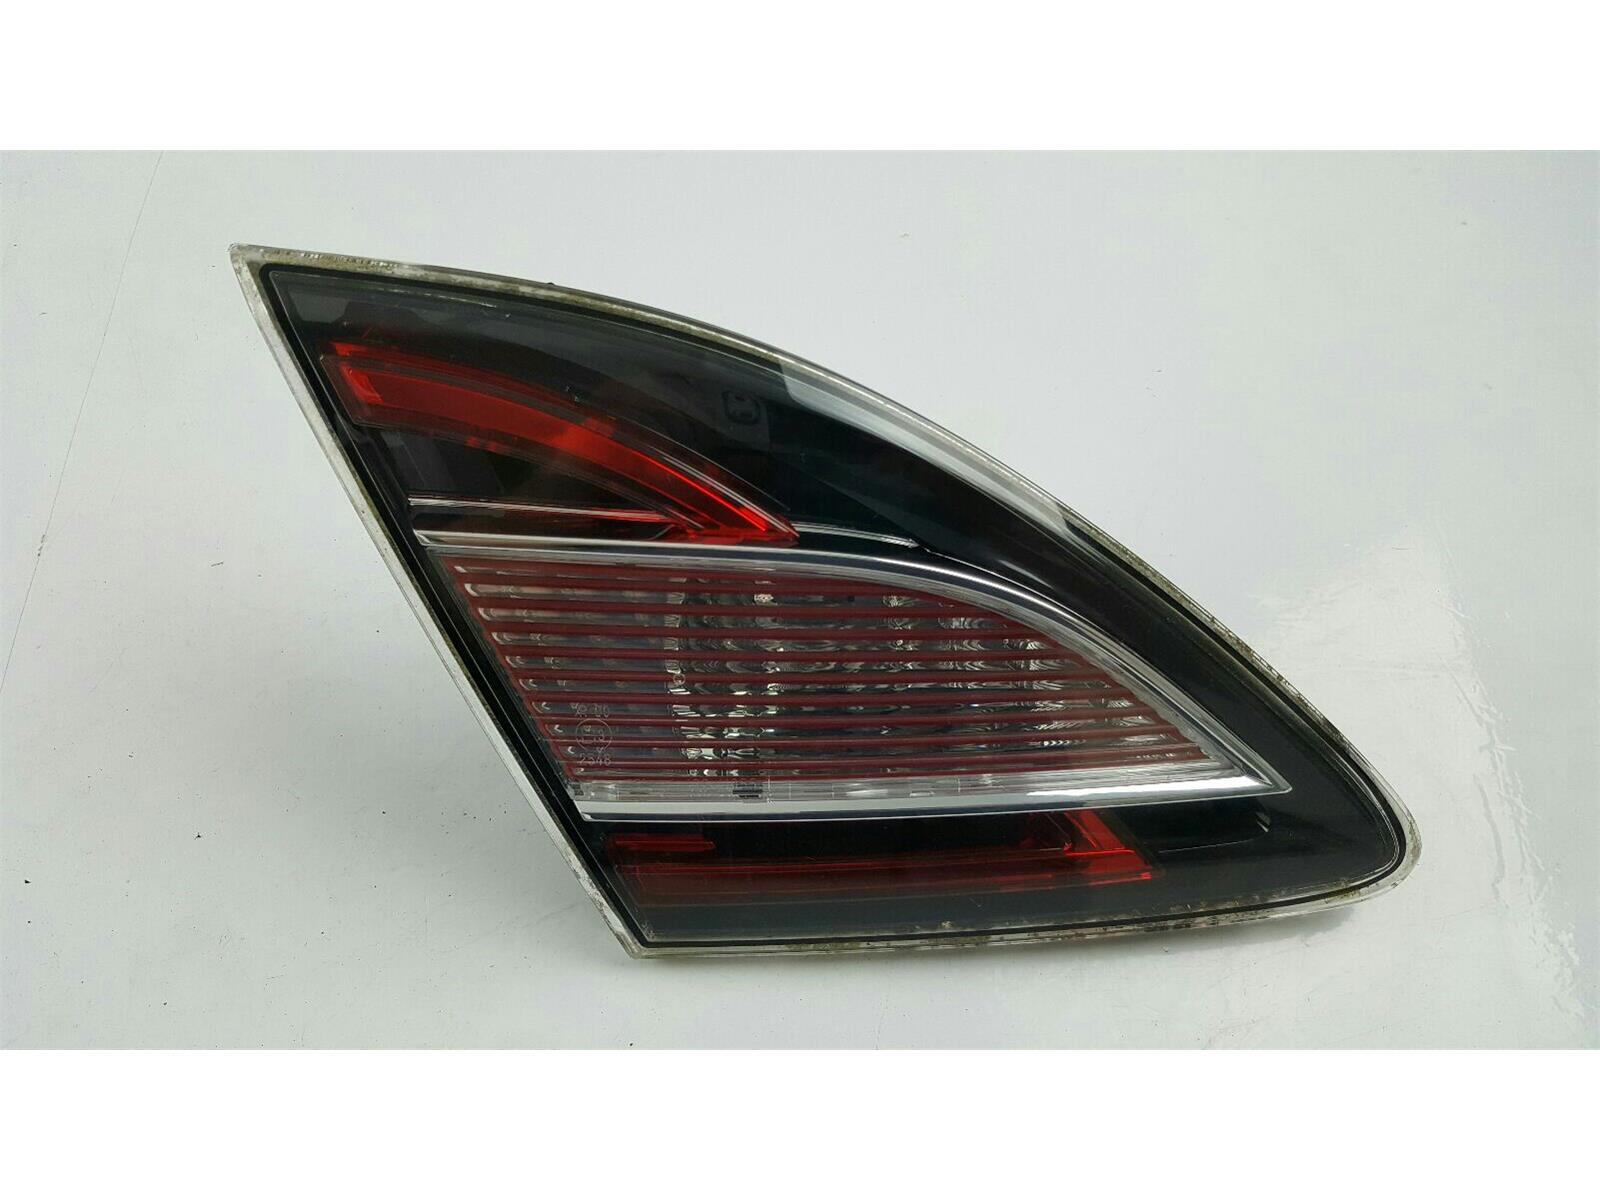 2008 MK2 Mazda 6 Rear Tail Light Lamp LH NS Passenger Side GS1F513F0 Koito